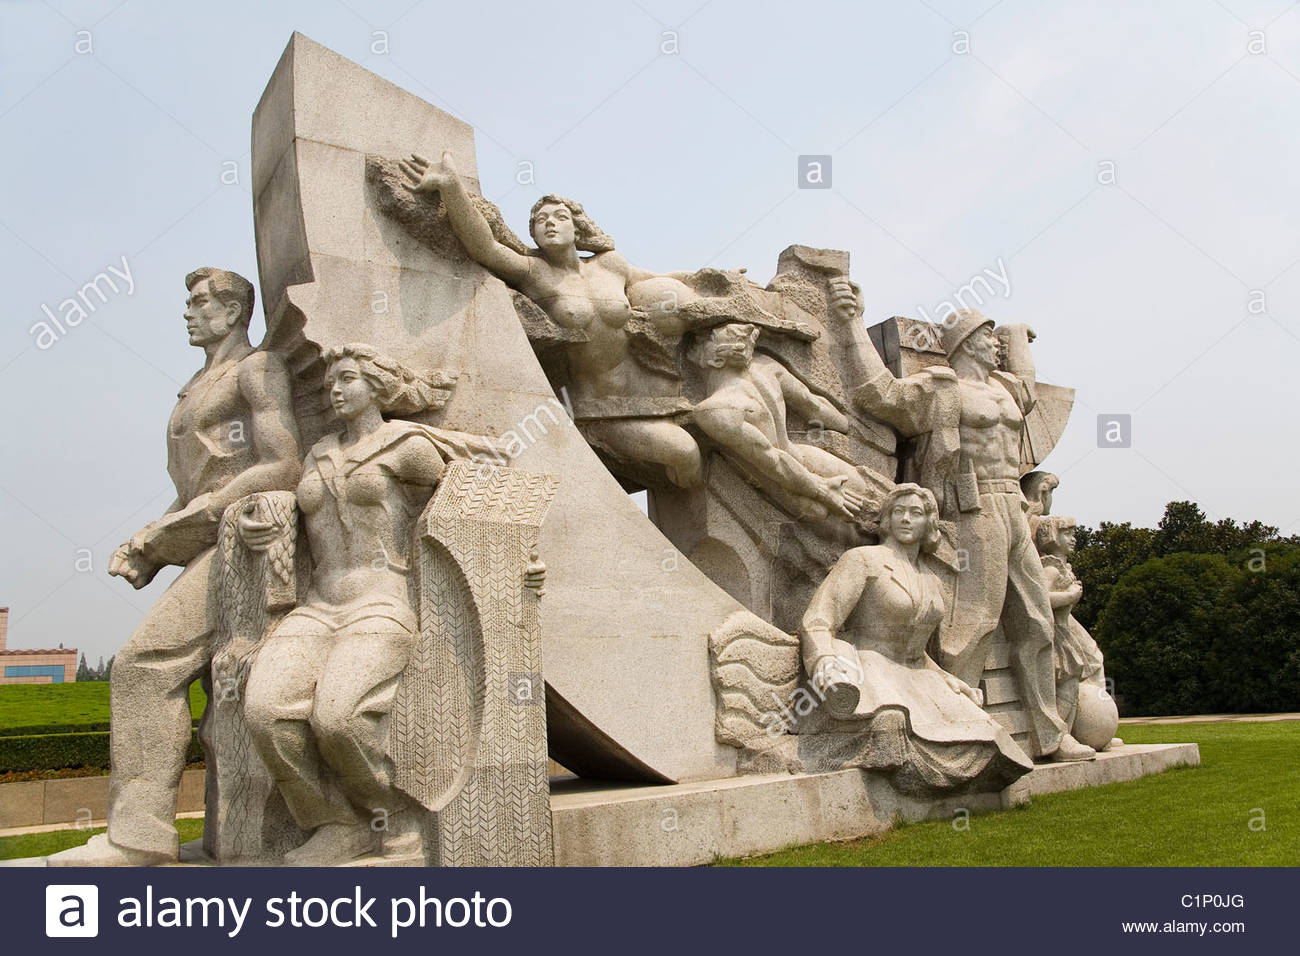 Shanghai, Longhua Martyrs Cemetery, China - Stock Image